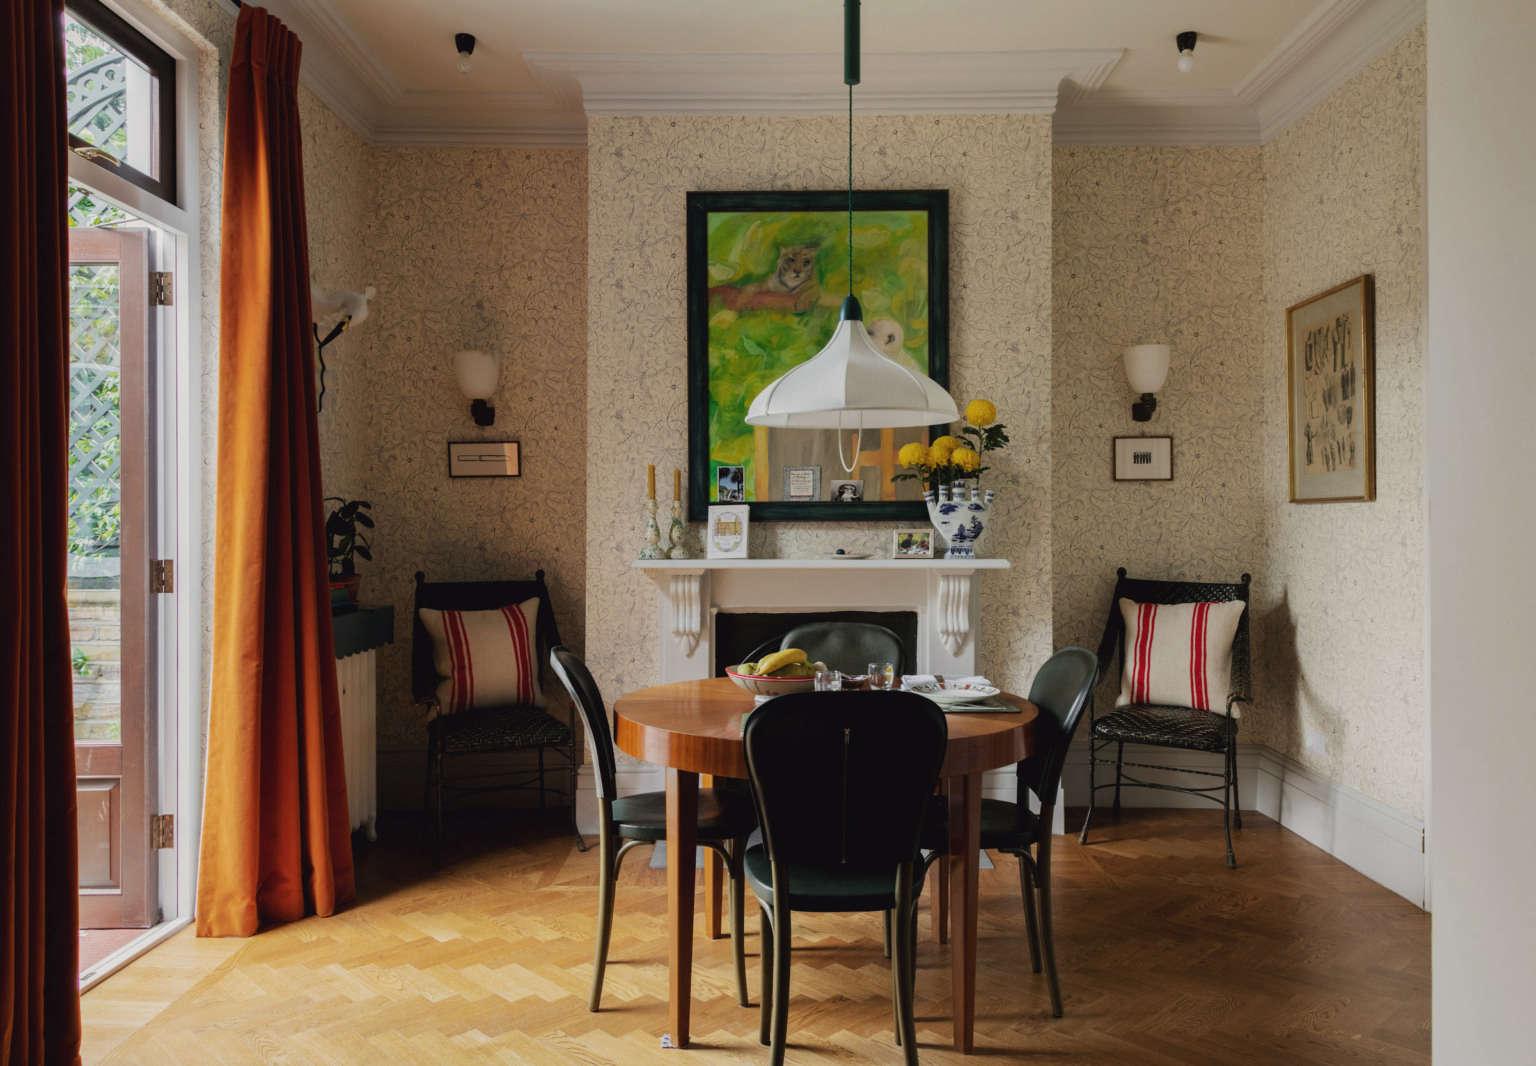 beata heuman modern house london dining room